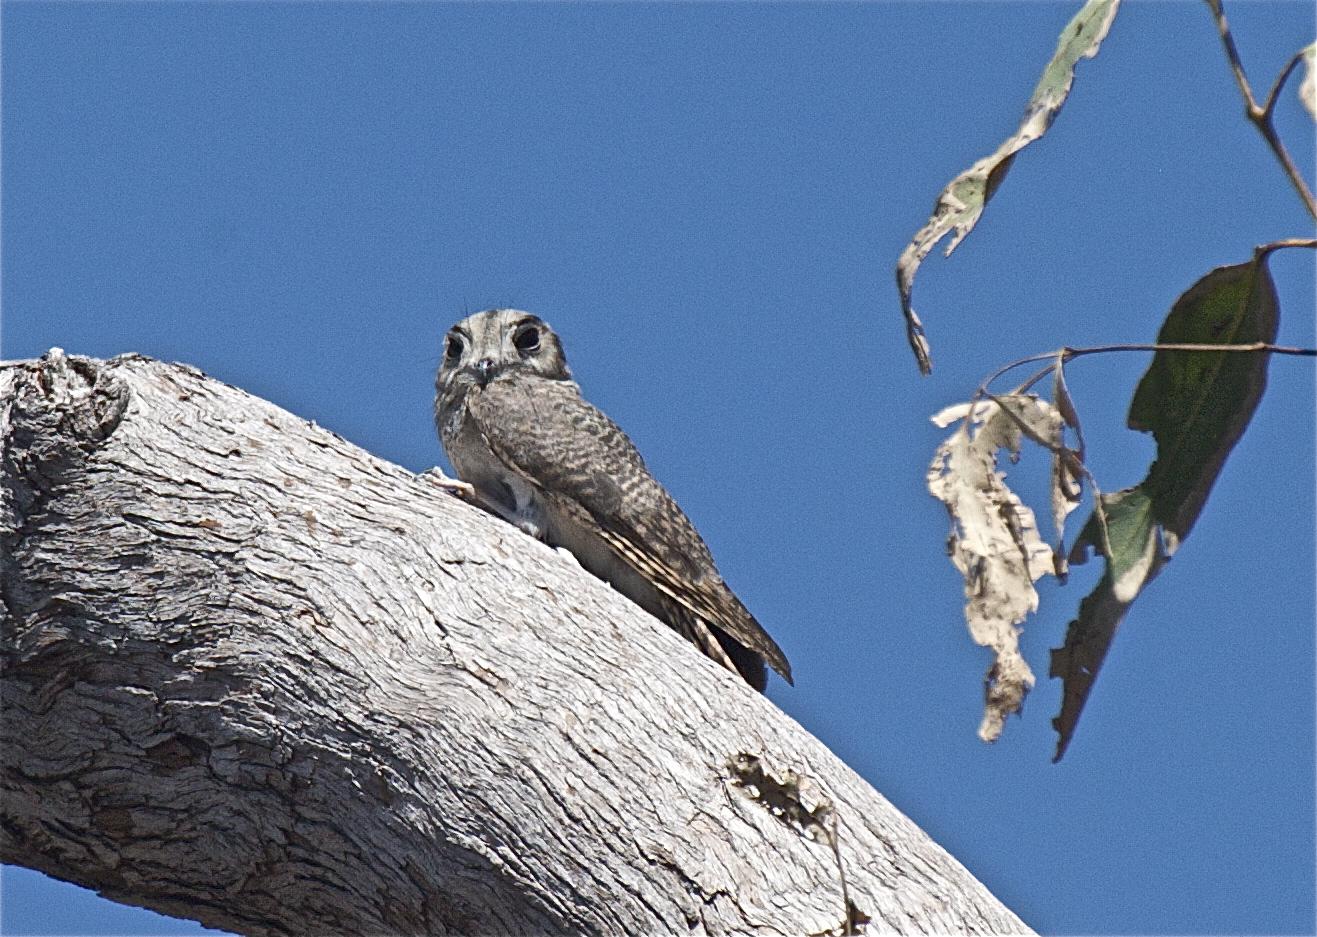 Australian Owlet-nightjar on the tree